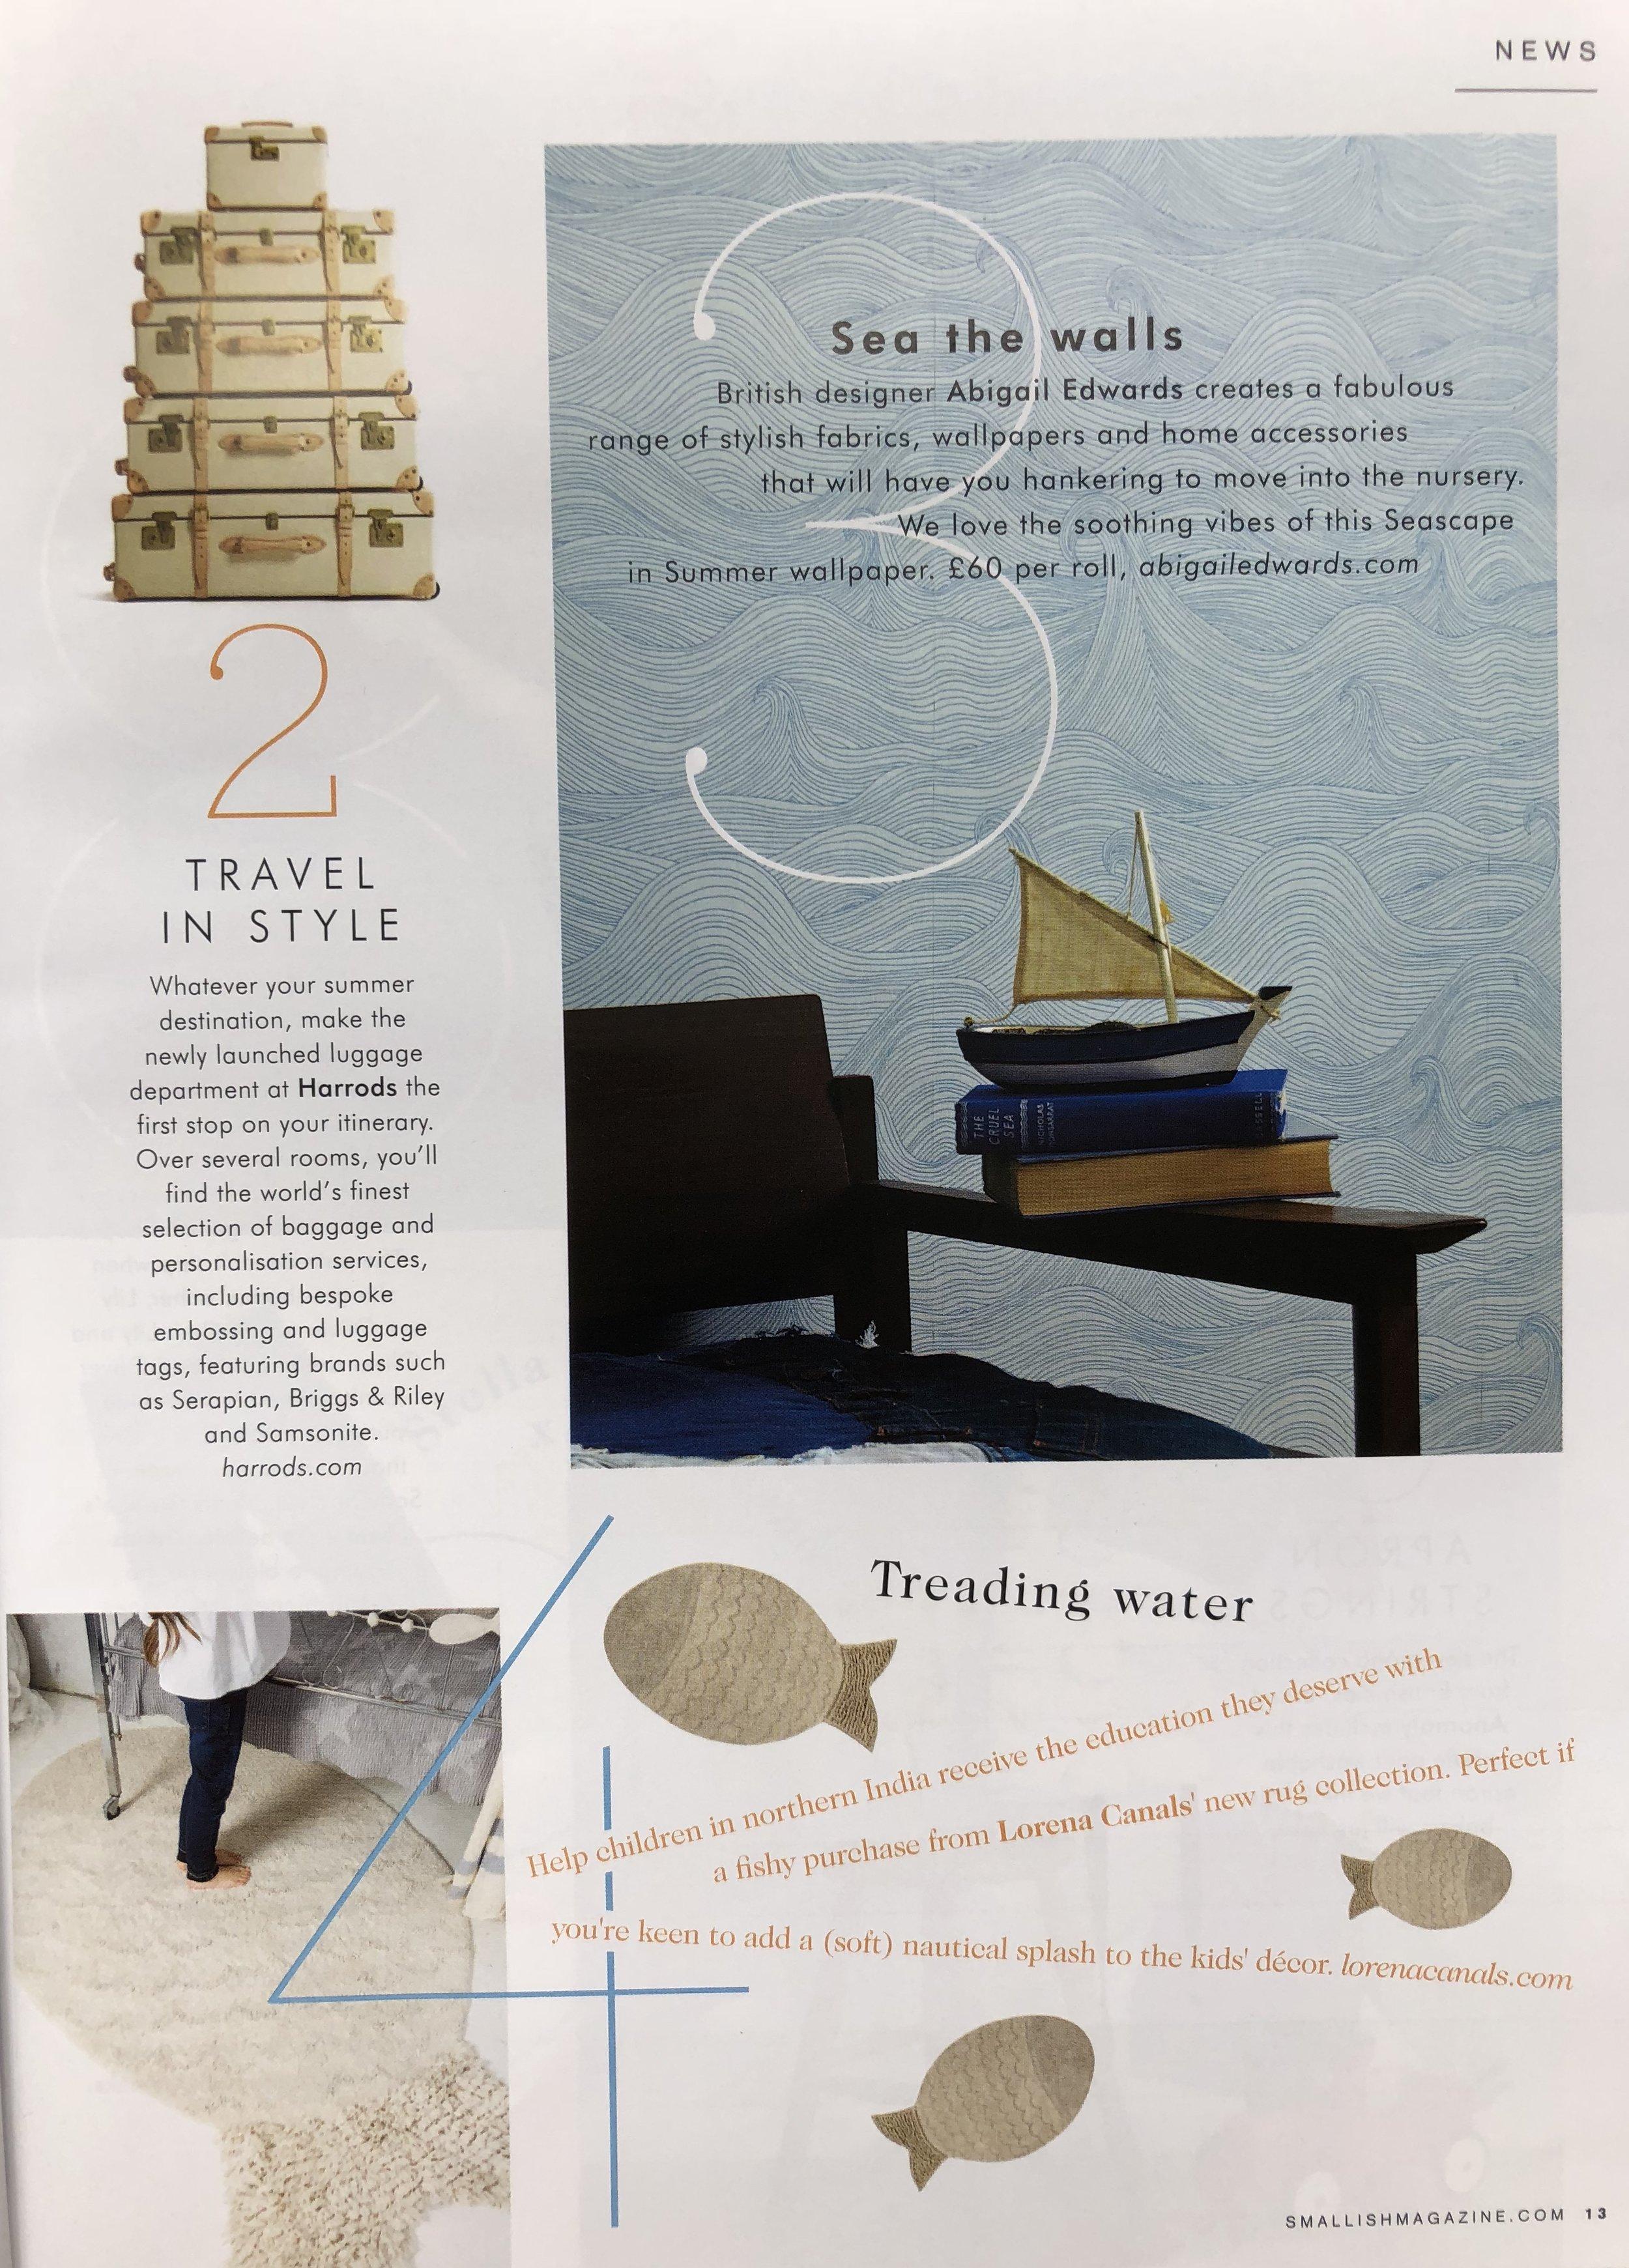 Seascape wallpaper in Summer in Smallish magazine